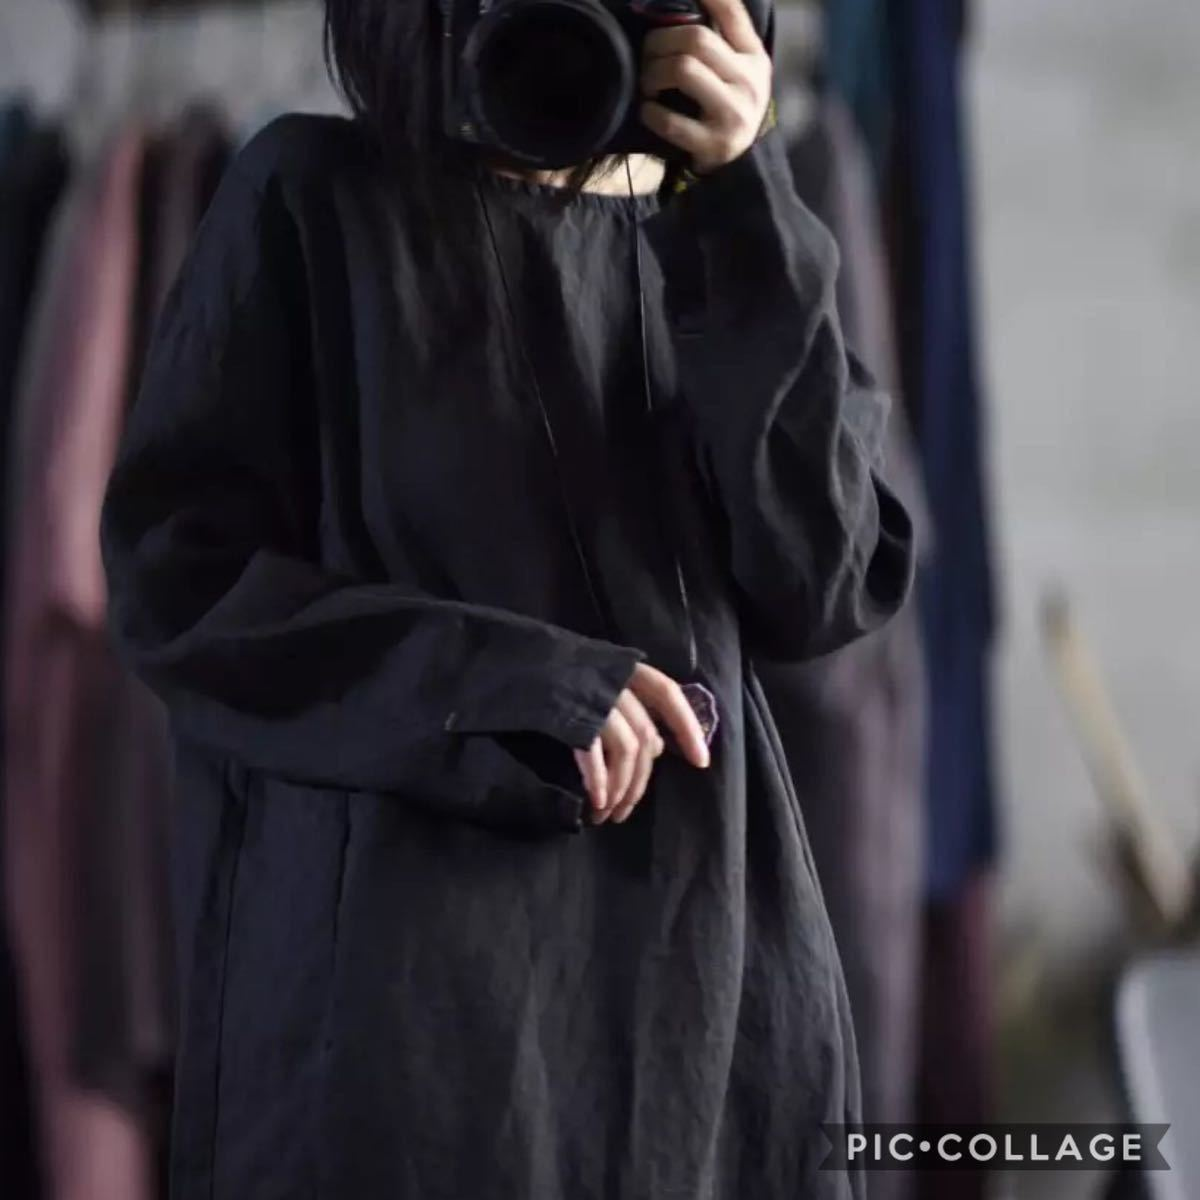 f3 新品 送料無料 レディース リネン100% 麻 長袖 ロングワンピース シンプル ゆったり 秋 冬 ブラック 刺繍 ナチュラル 黒 L